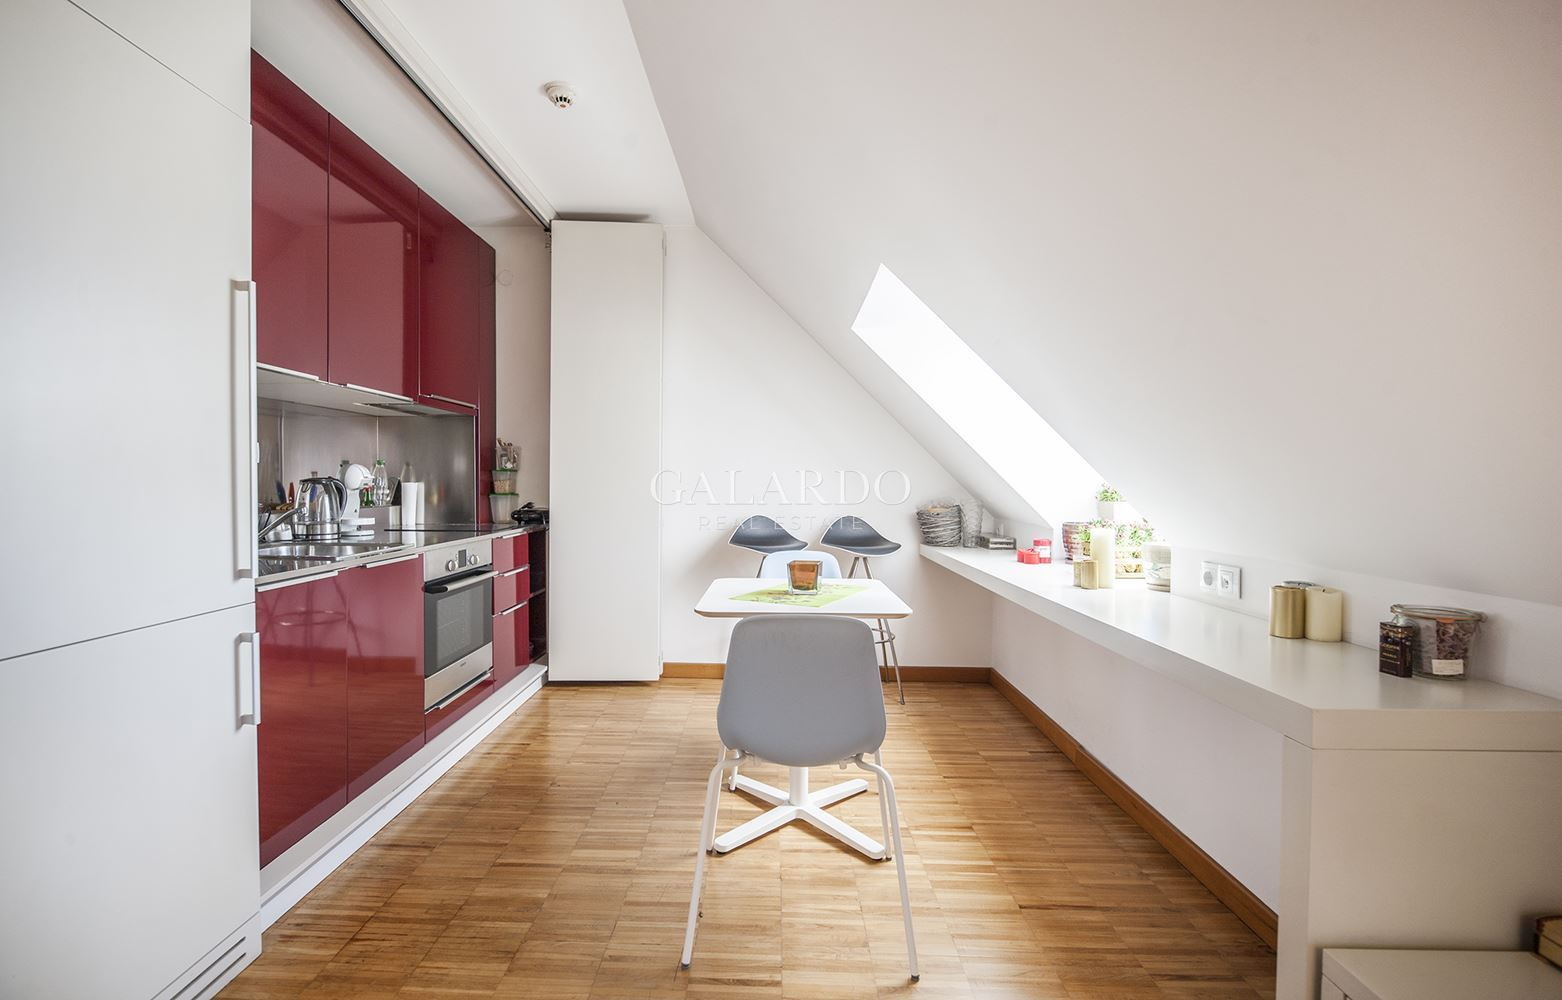 Дизайнерски апартамент в Докторска градина